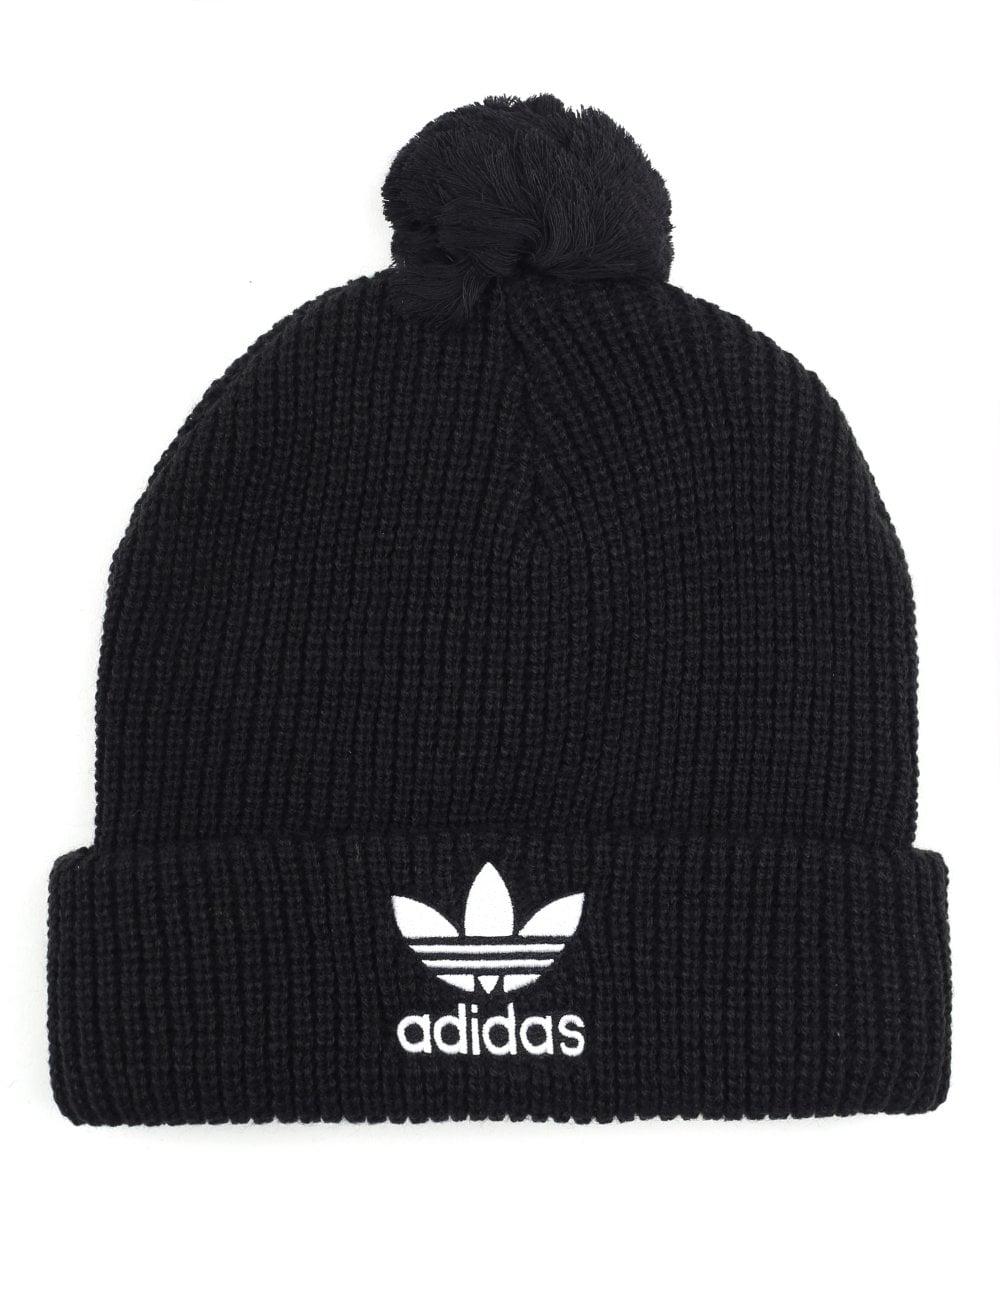 Adidas Men s Pom Pom Beanie Hat 75a4fb8a1